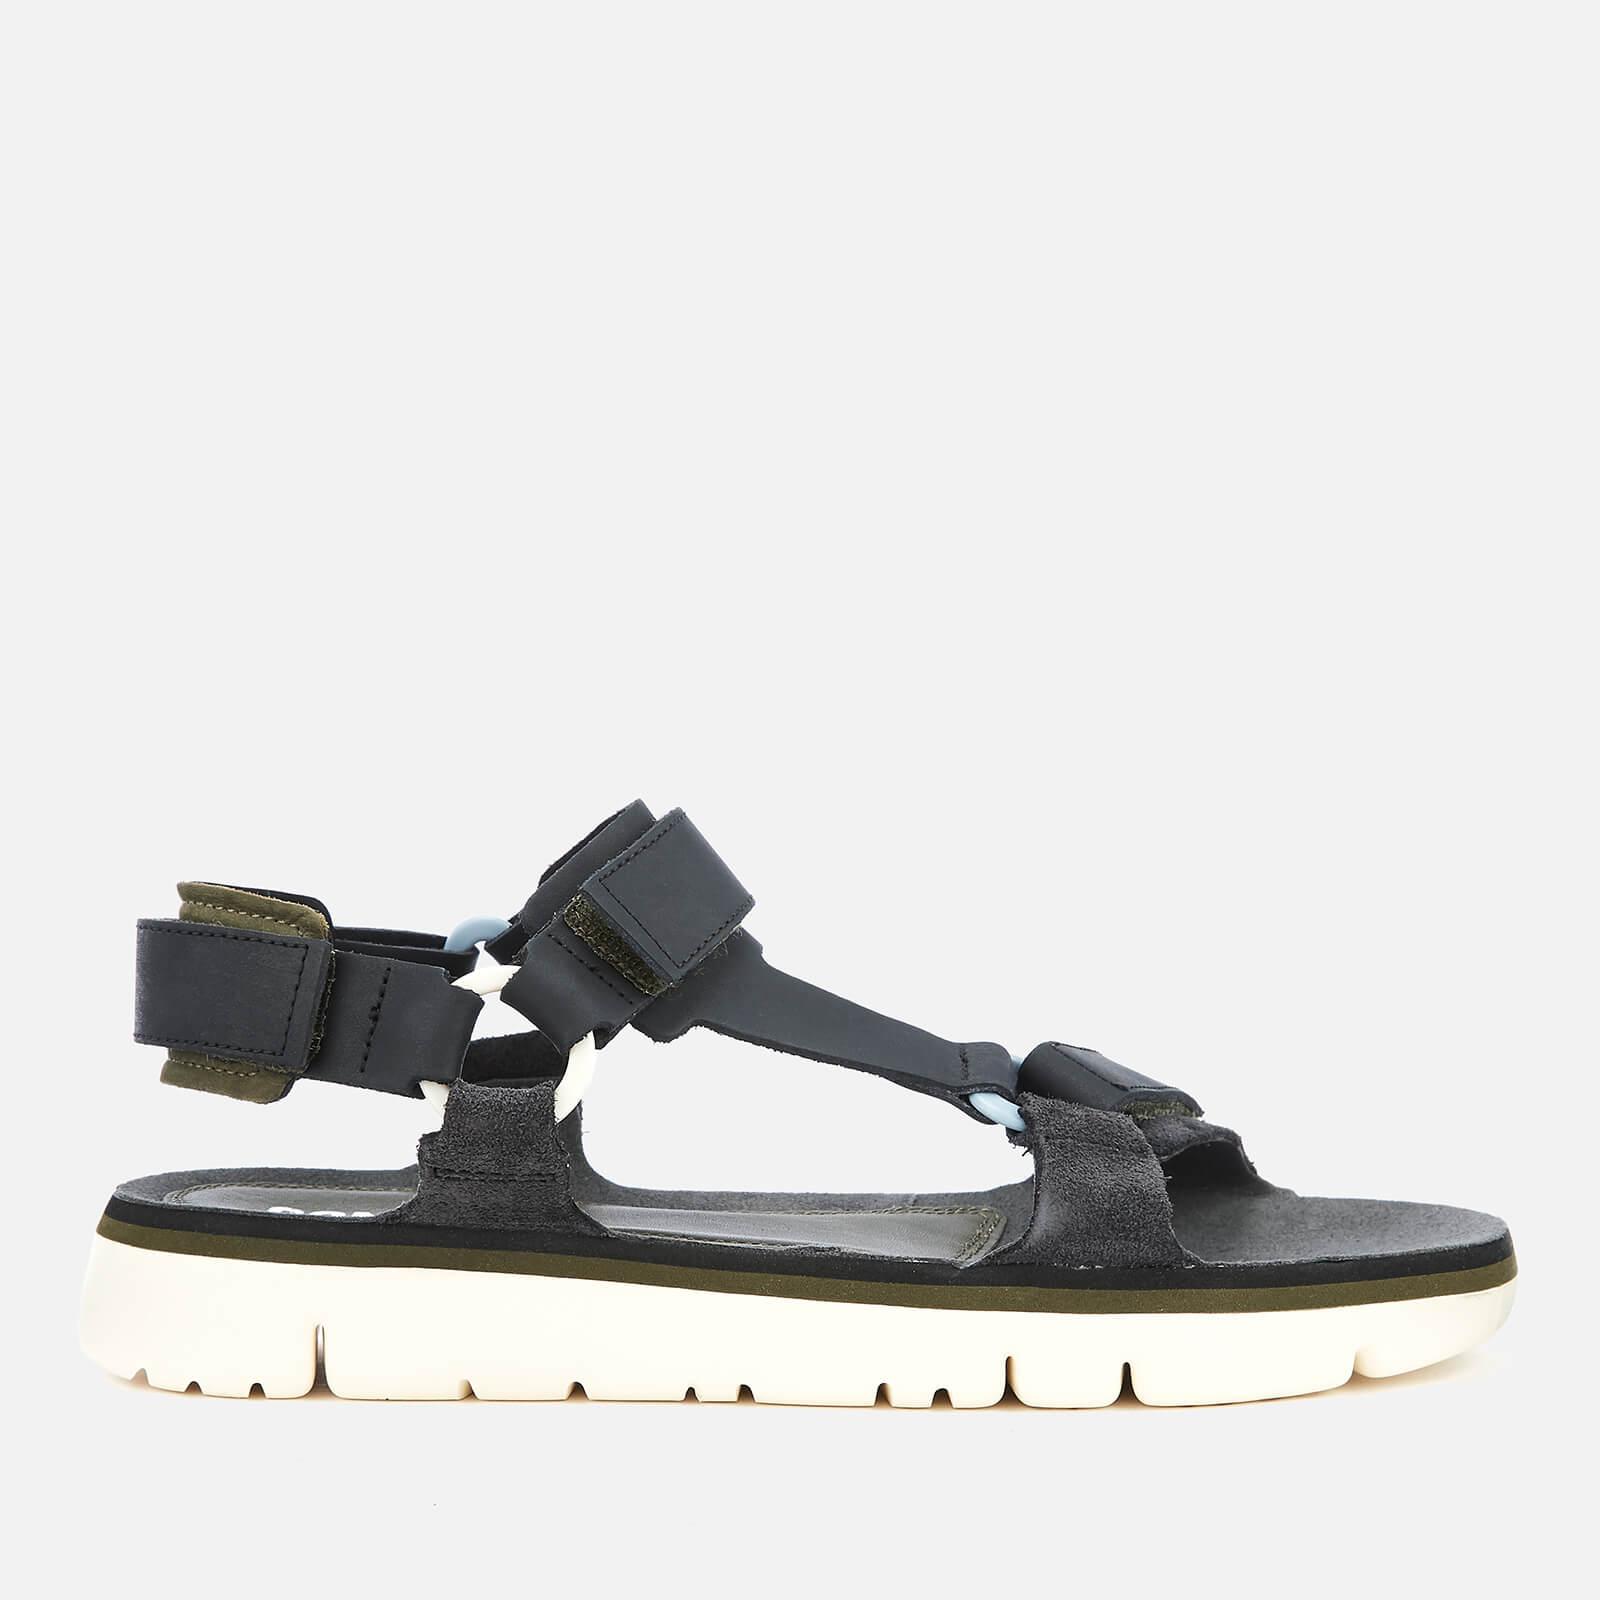 Camper Men's Oruga Sandals - Multi - UK 10 - Black